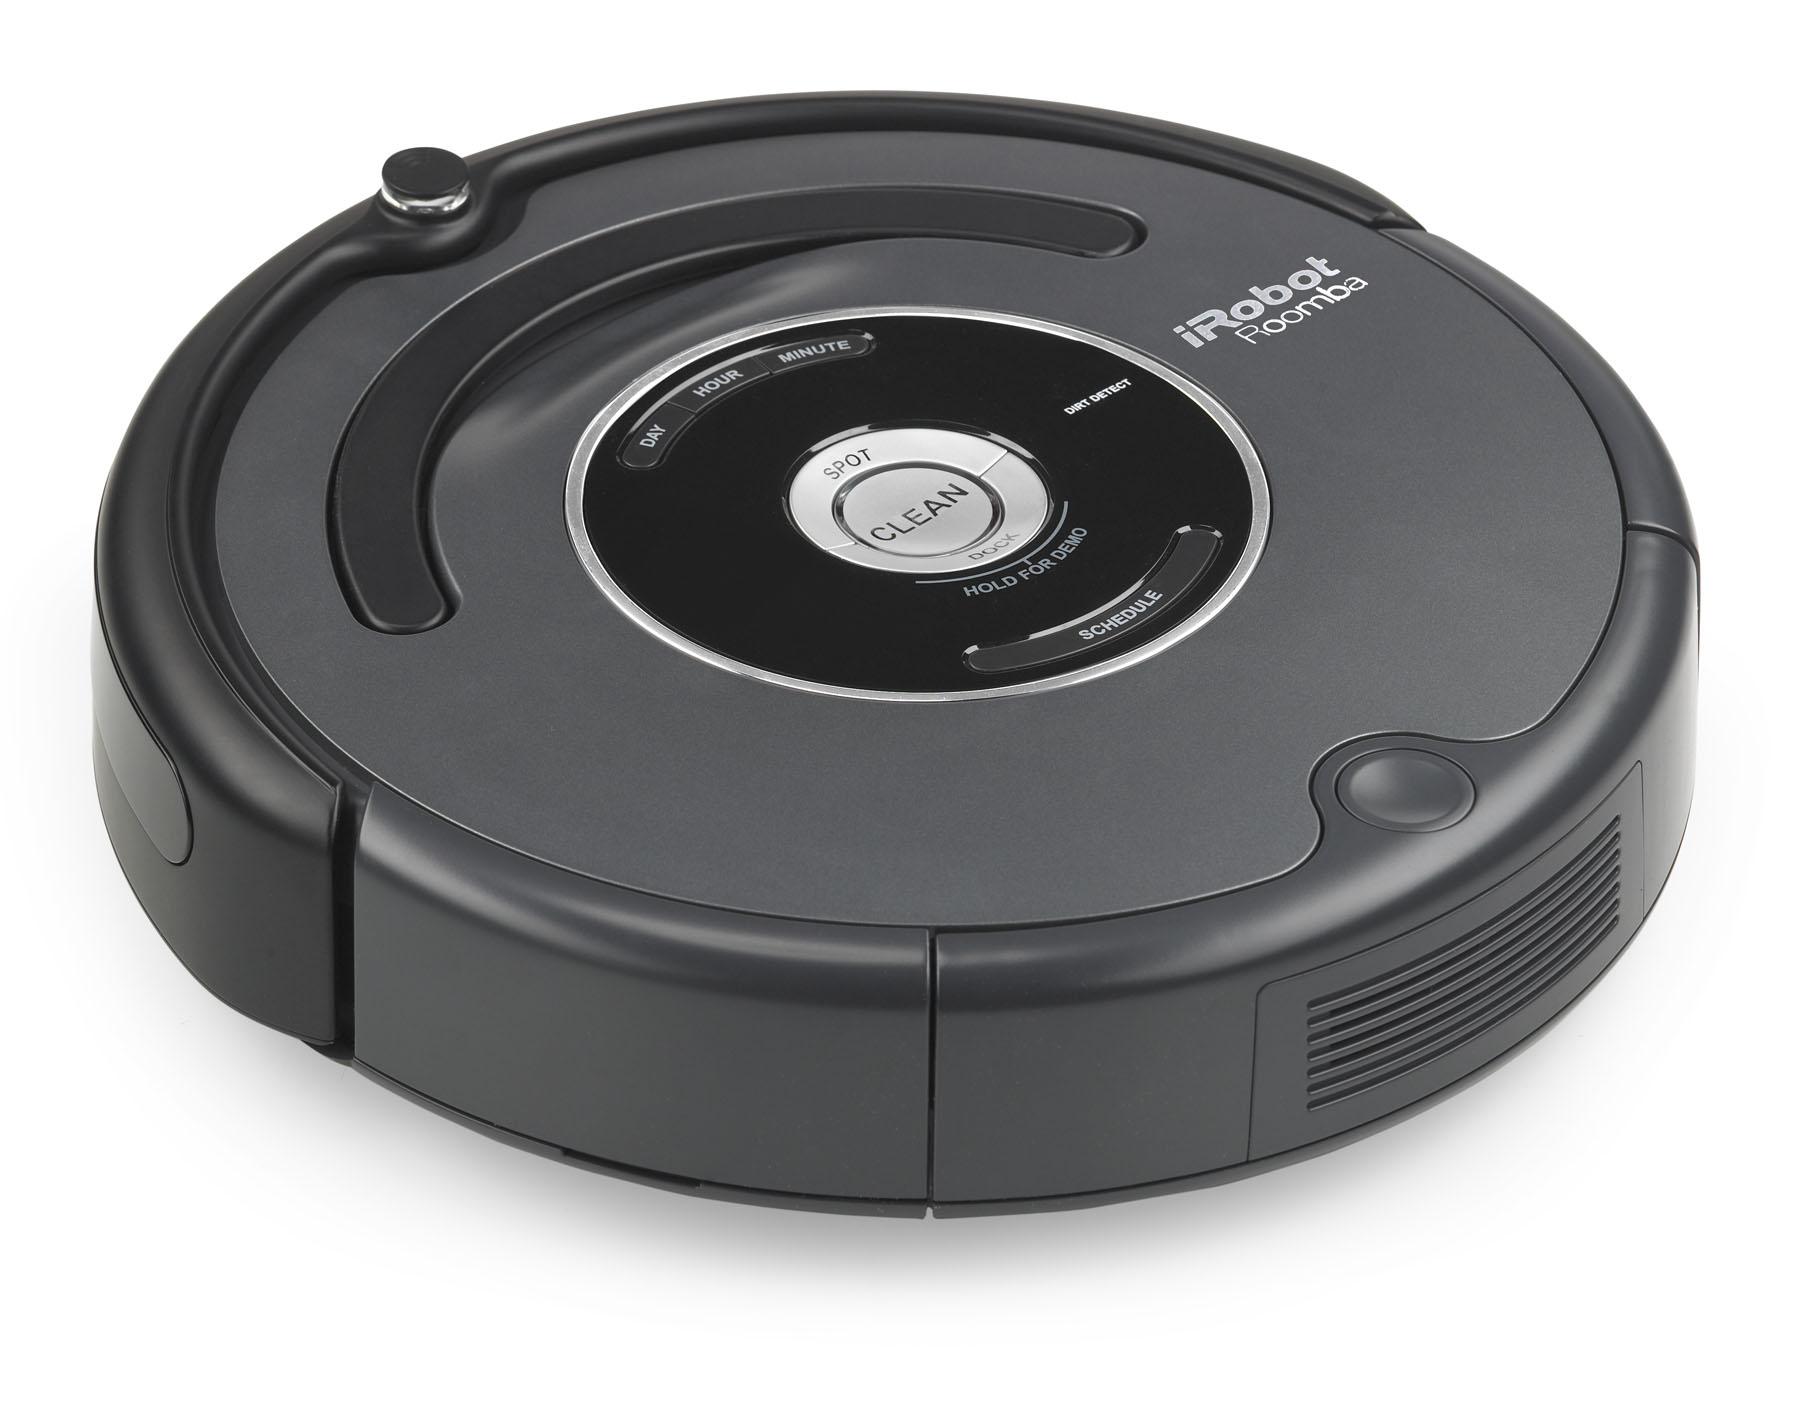 560-Roomba-Vacuuming-RobotBlack2.jpg